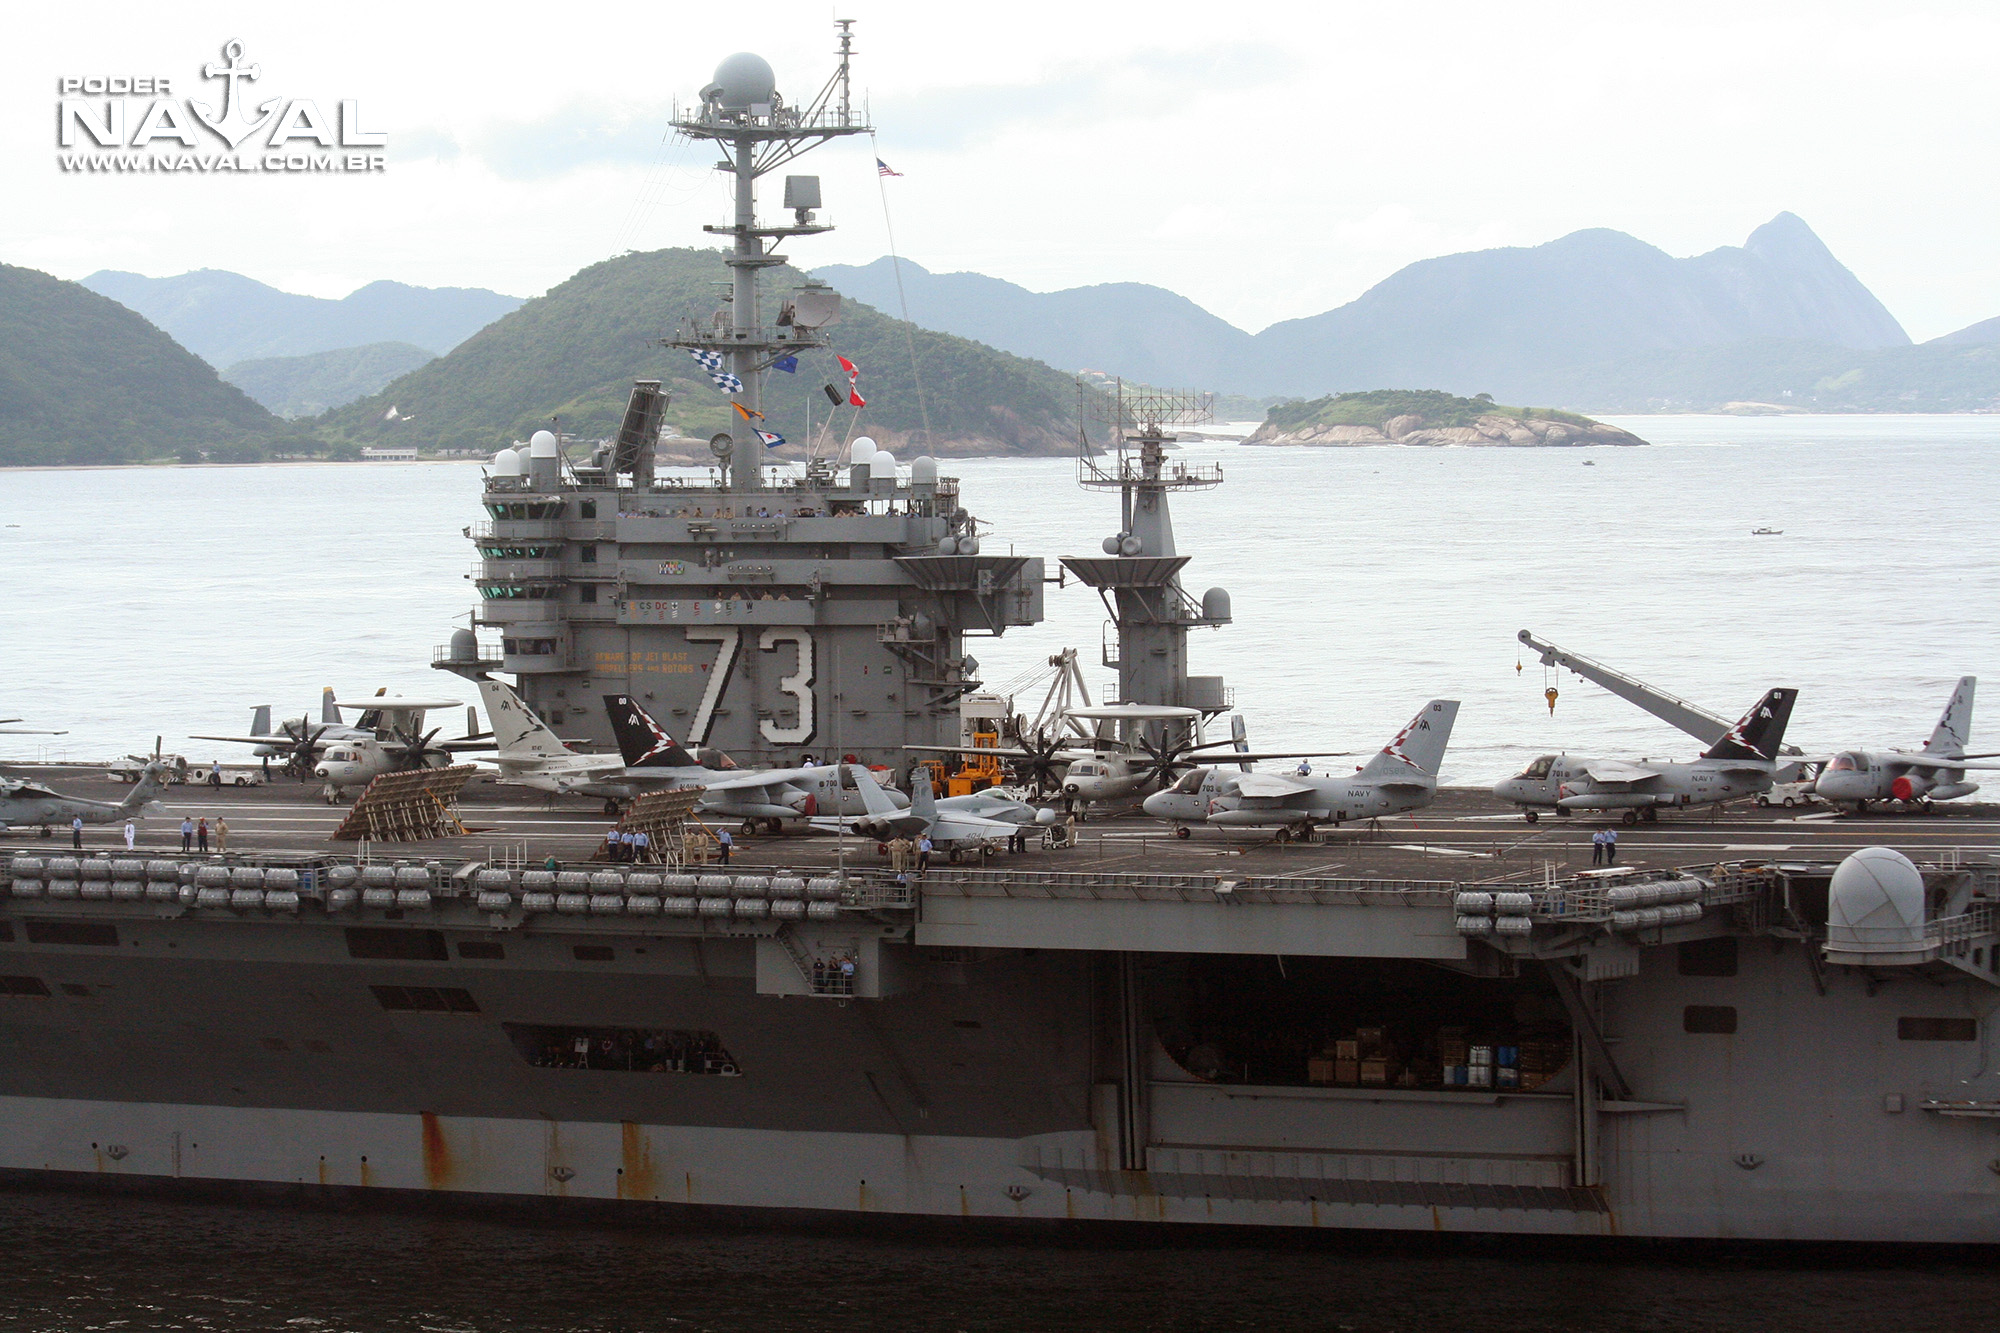 USS George Washington (CVN-73) no Rio - 2008 - 14